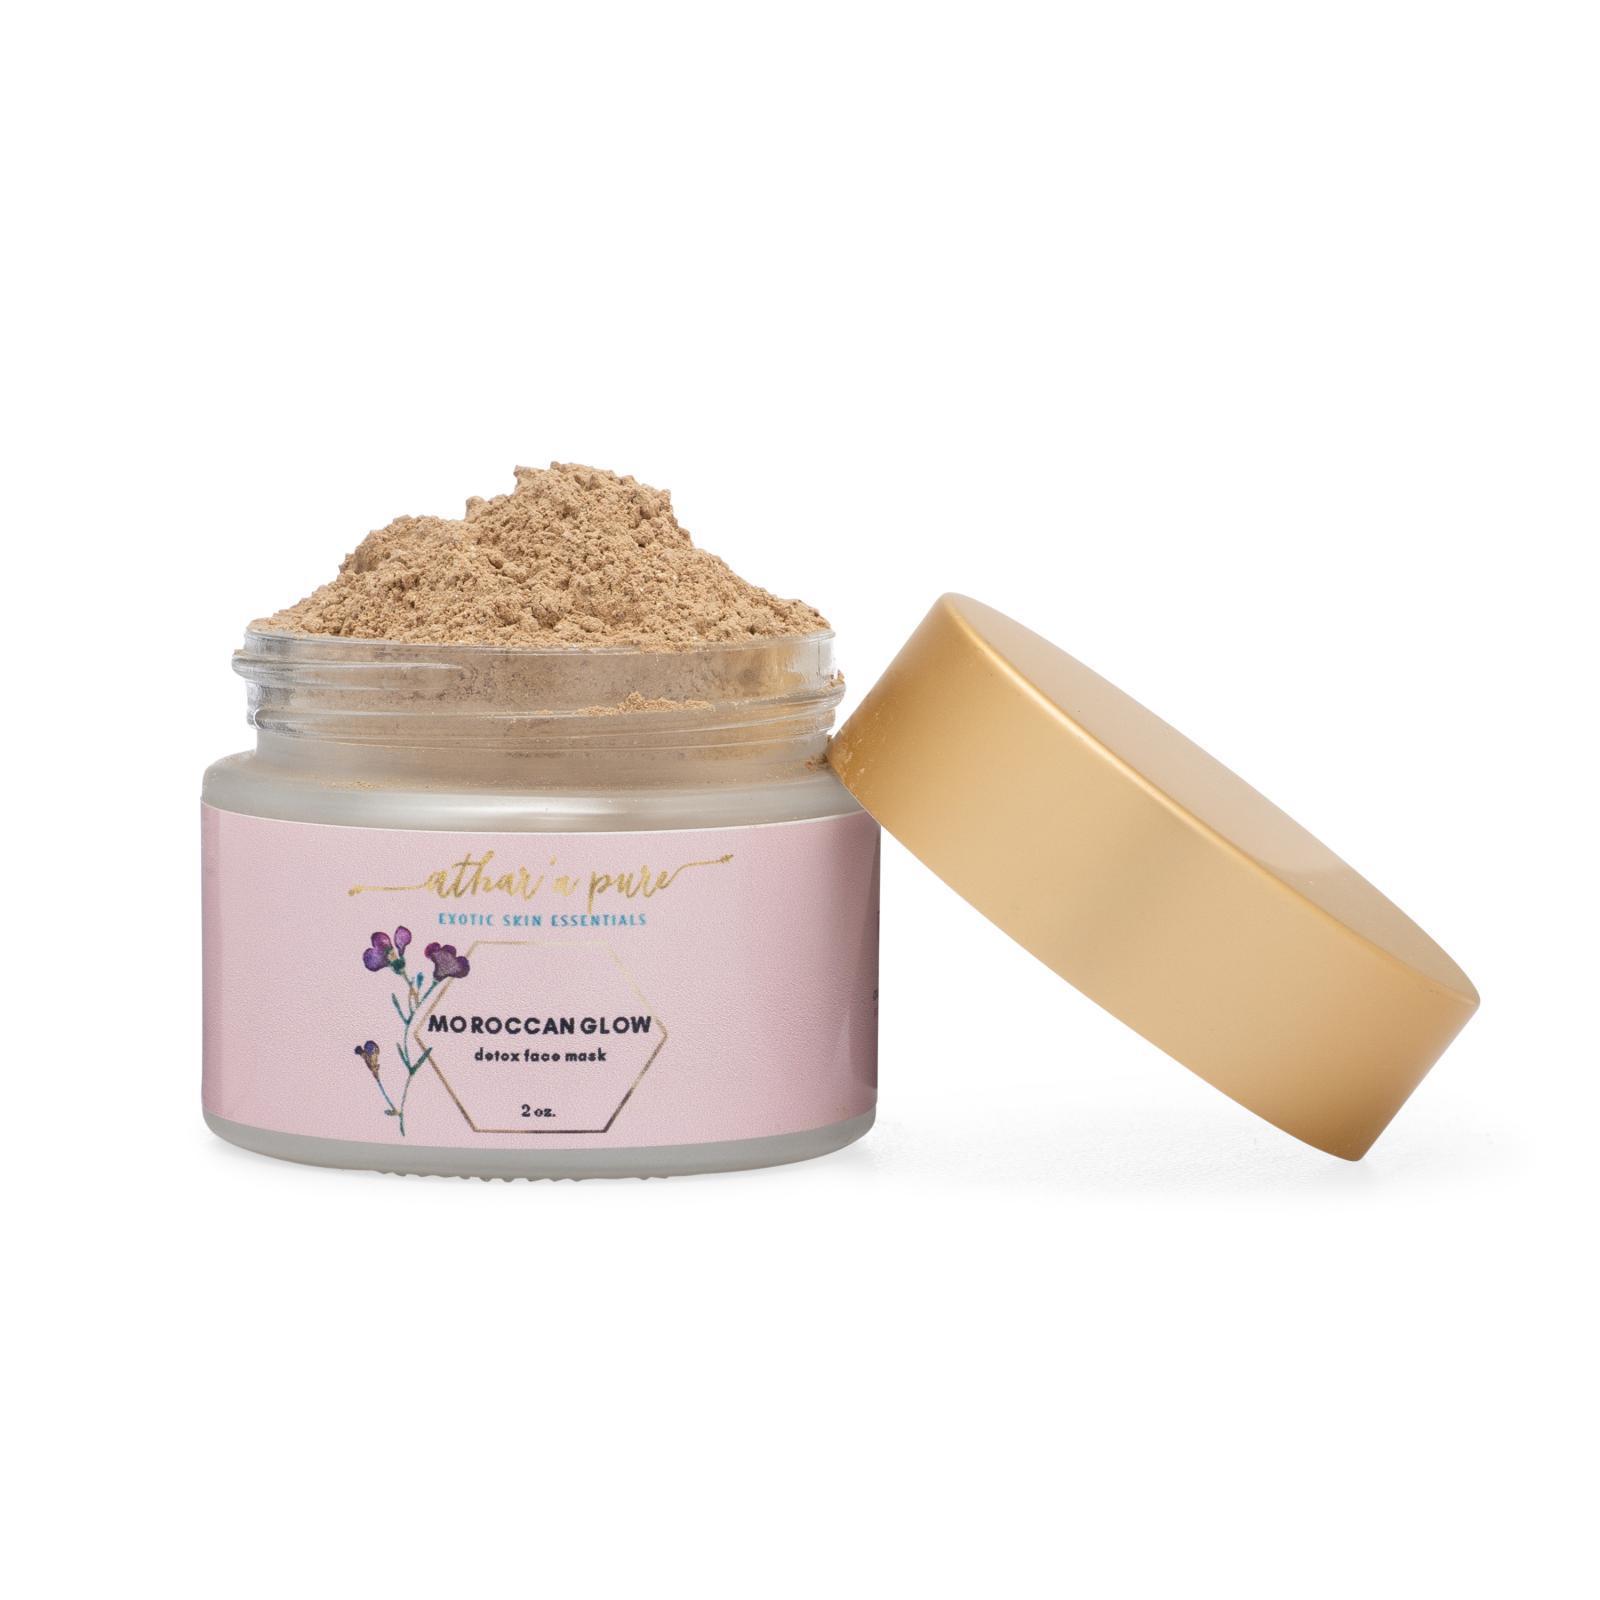 Moroccan Glow Detoxifying Face Mask™ (Vegan, 100% Natural)